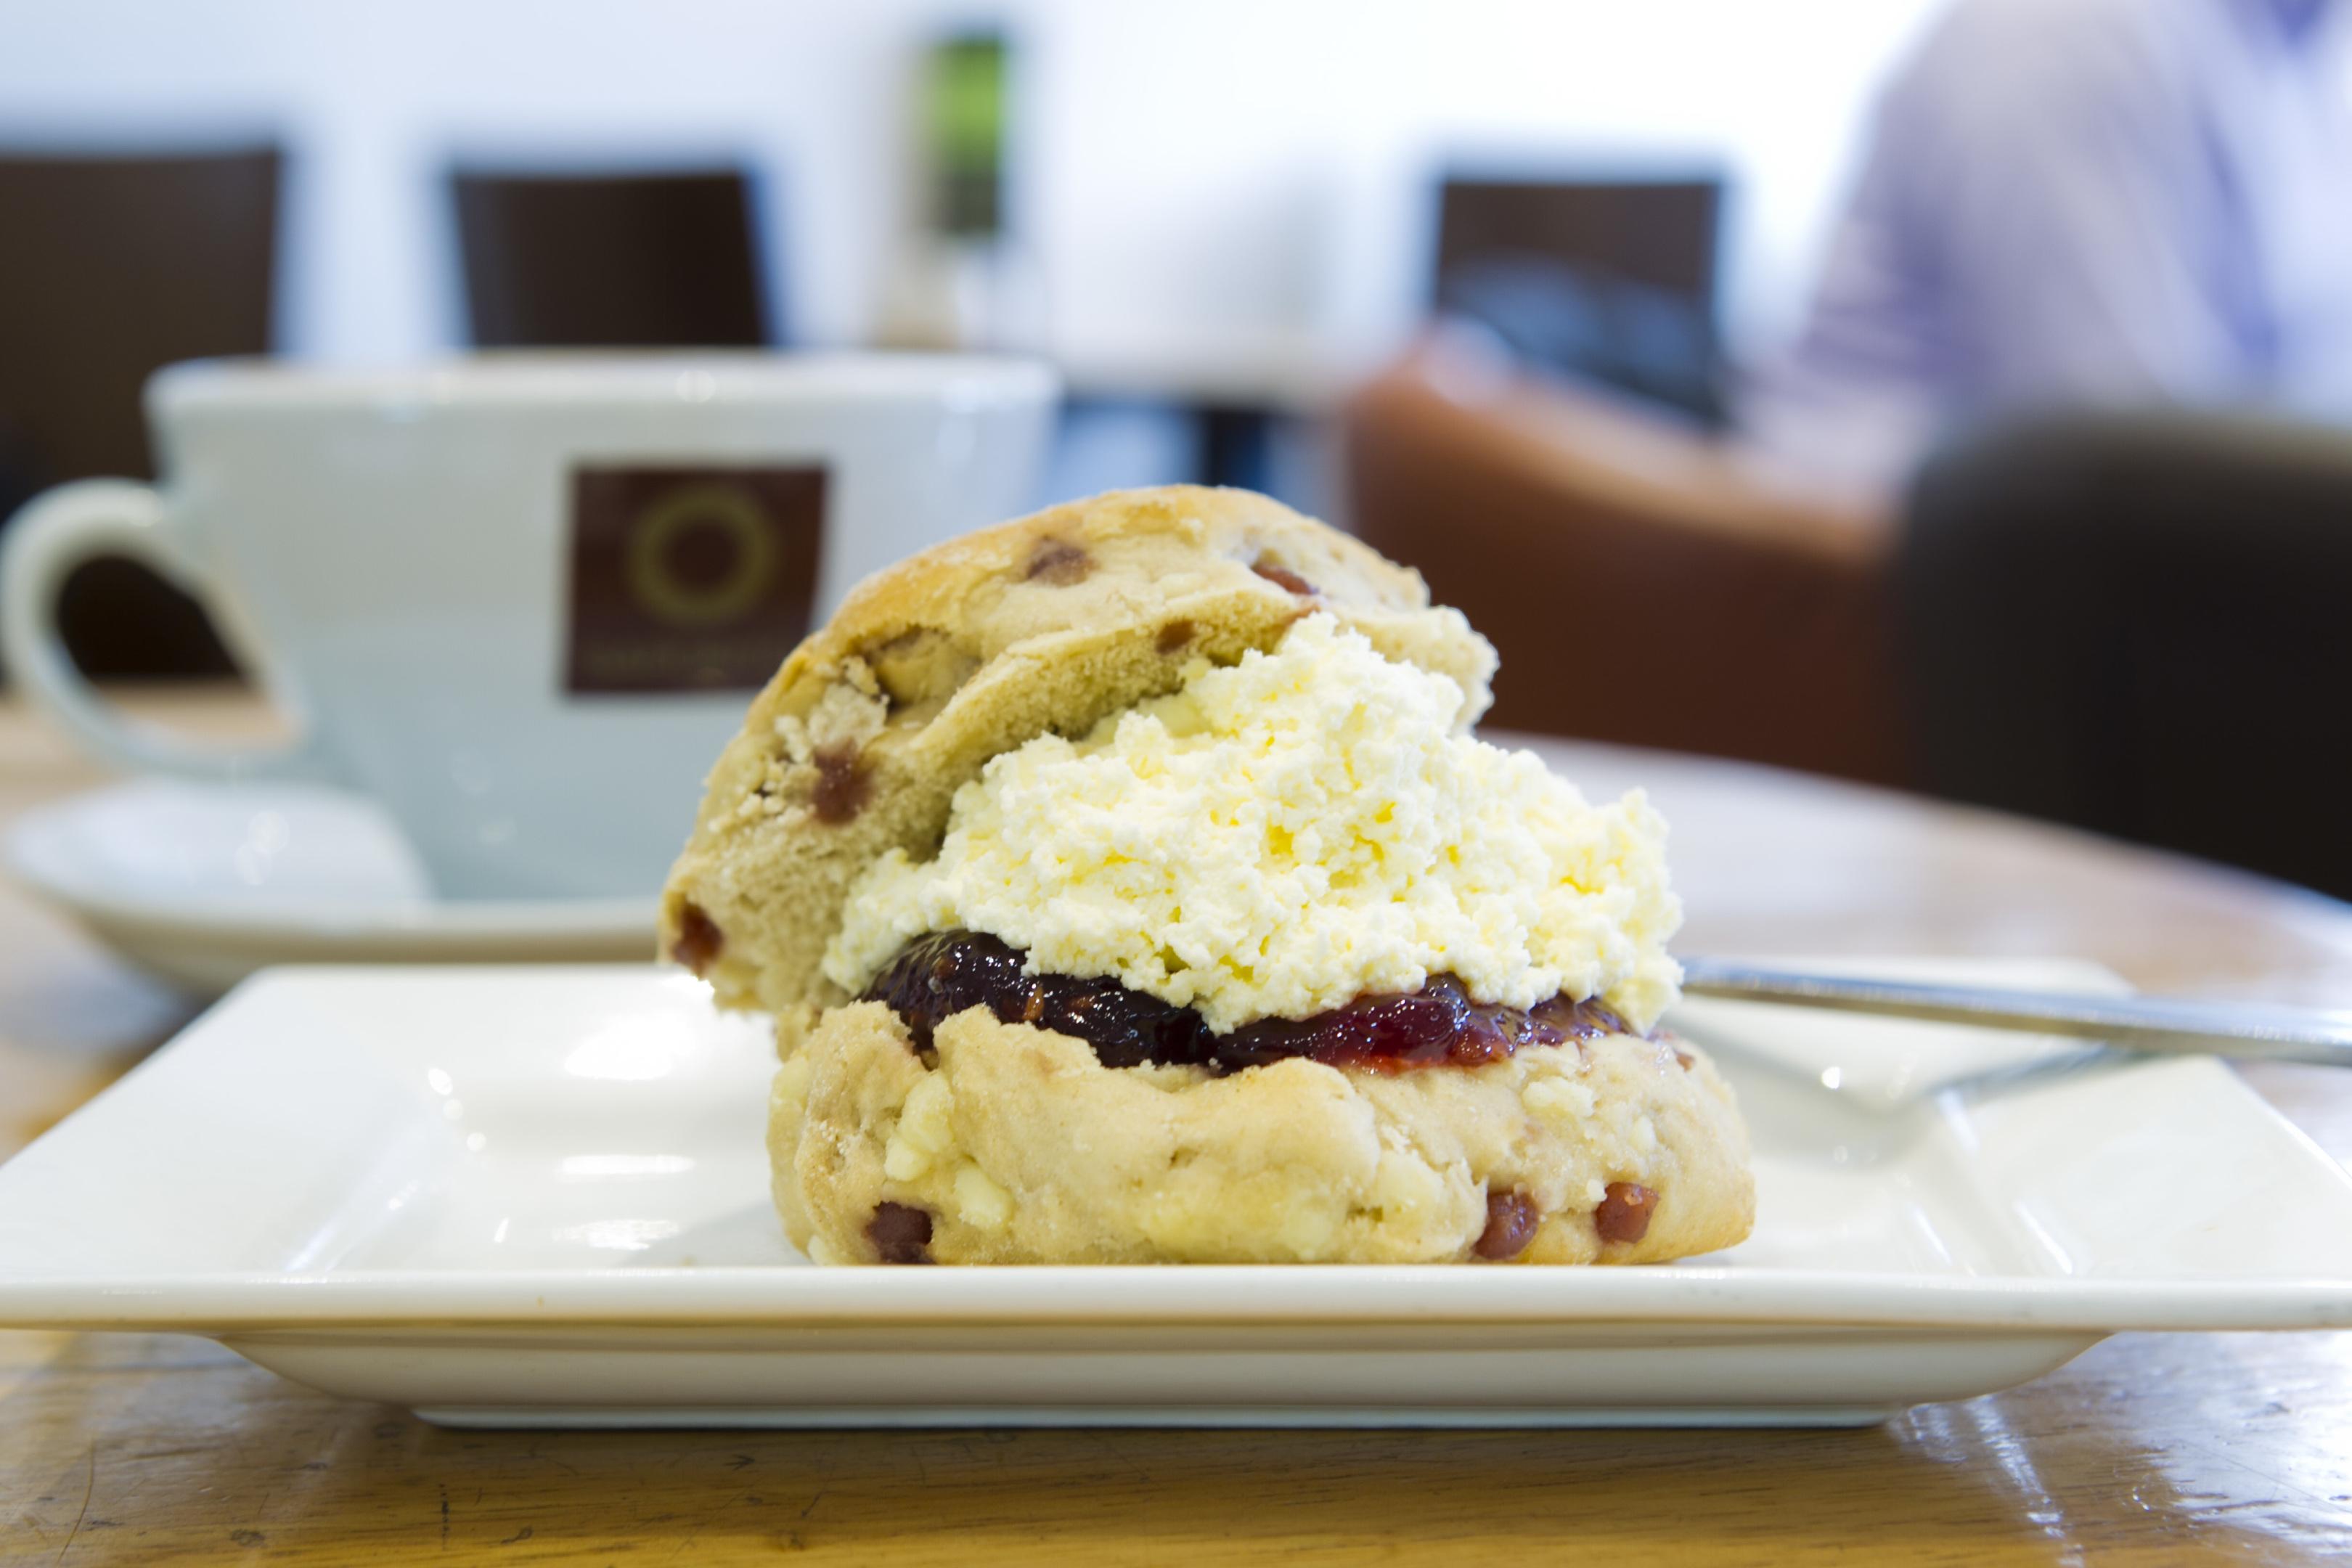 Saporito's delicious white chocolate and raspberry scone (Andrew Cawley / DC Thomson)